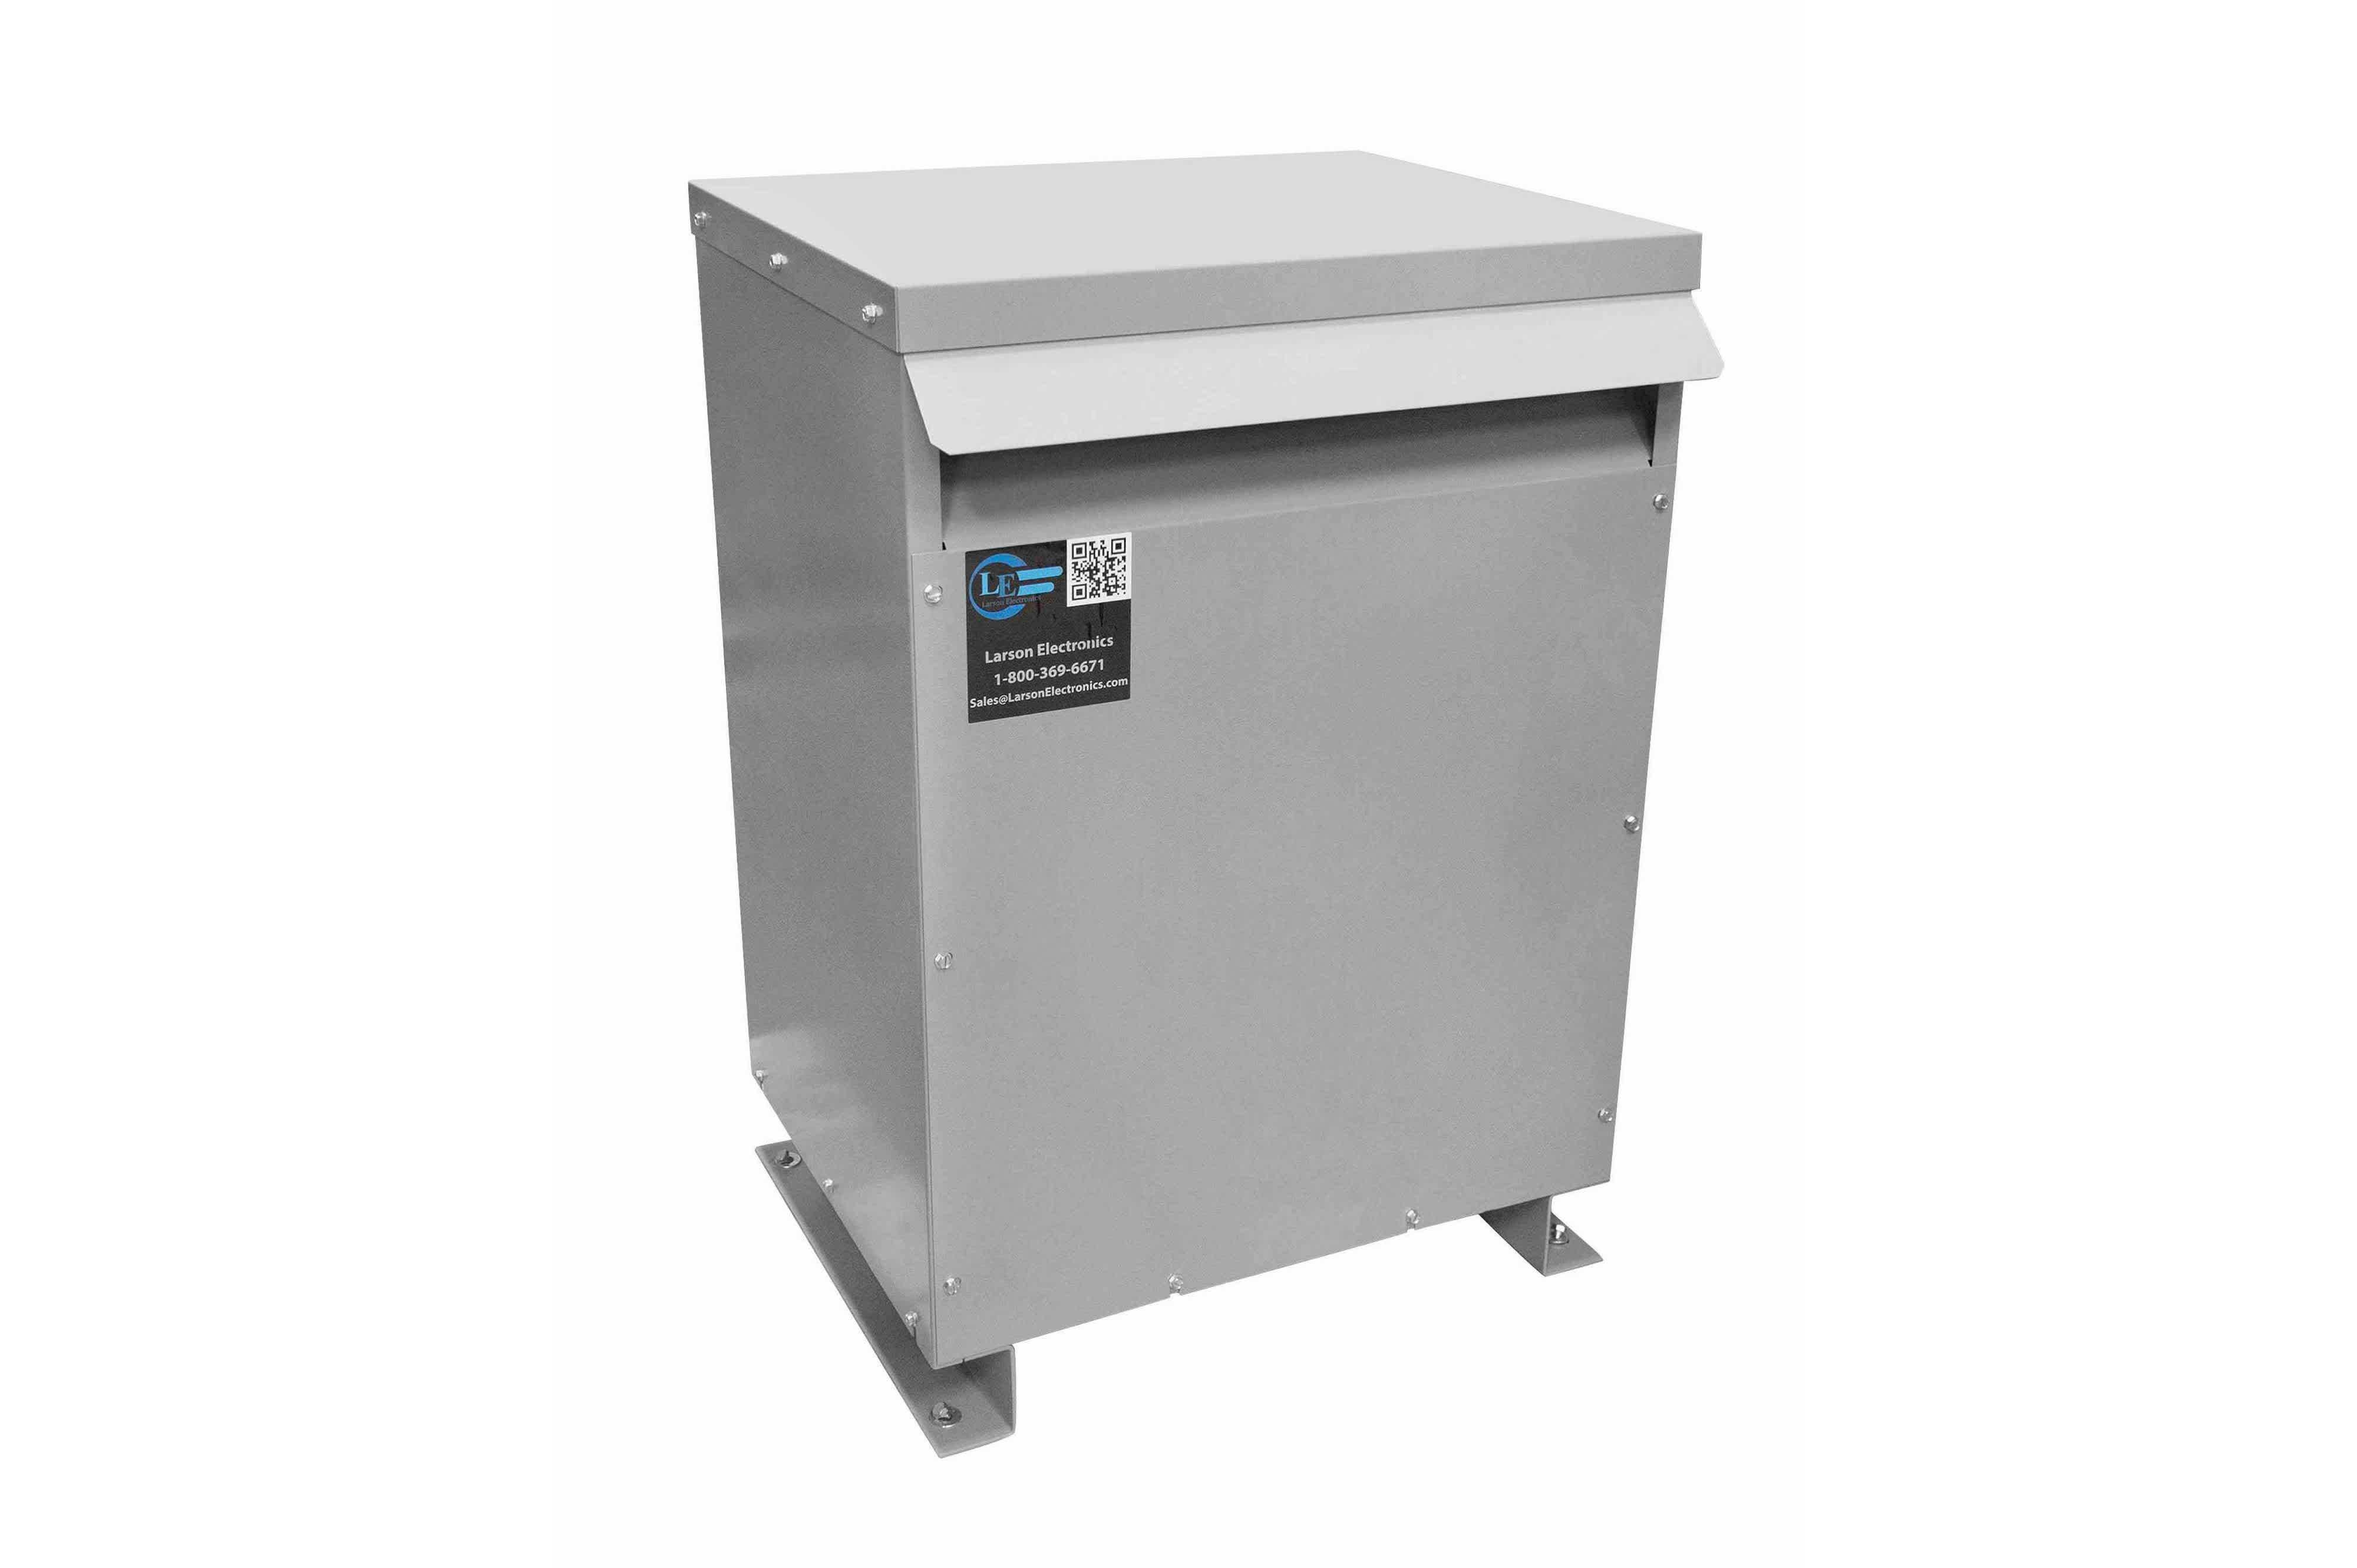 37.5 kVA 3PH Isolation Transformer, 600V Wye Primary, 240V Delta Secondary, N3R, Ventilated, 60 Hz